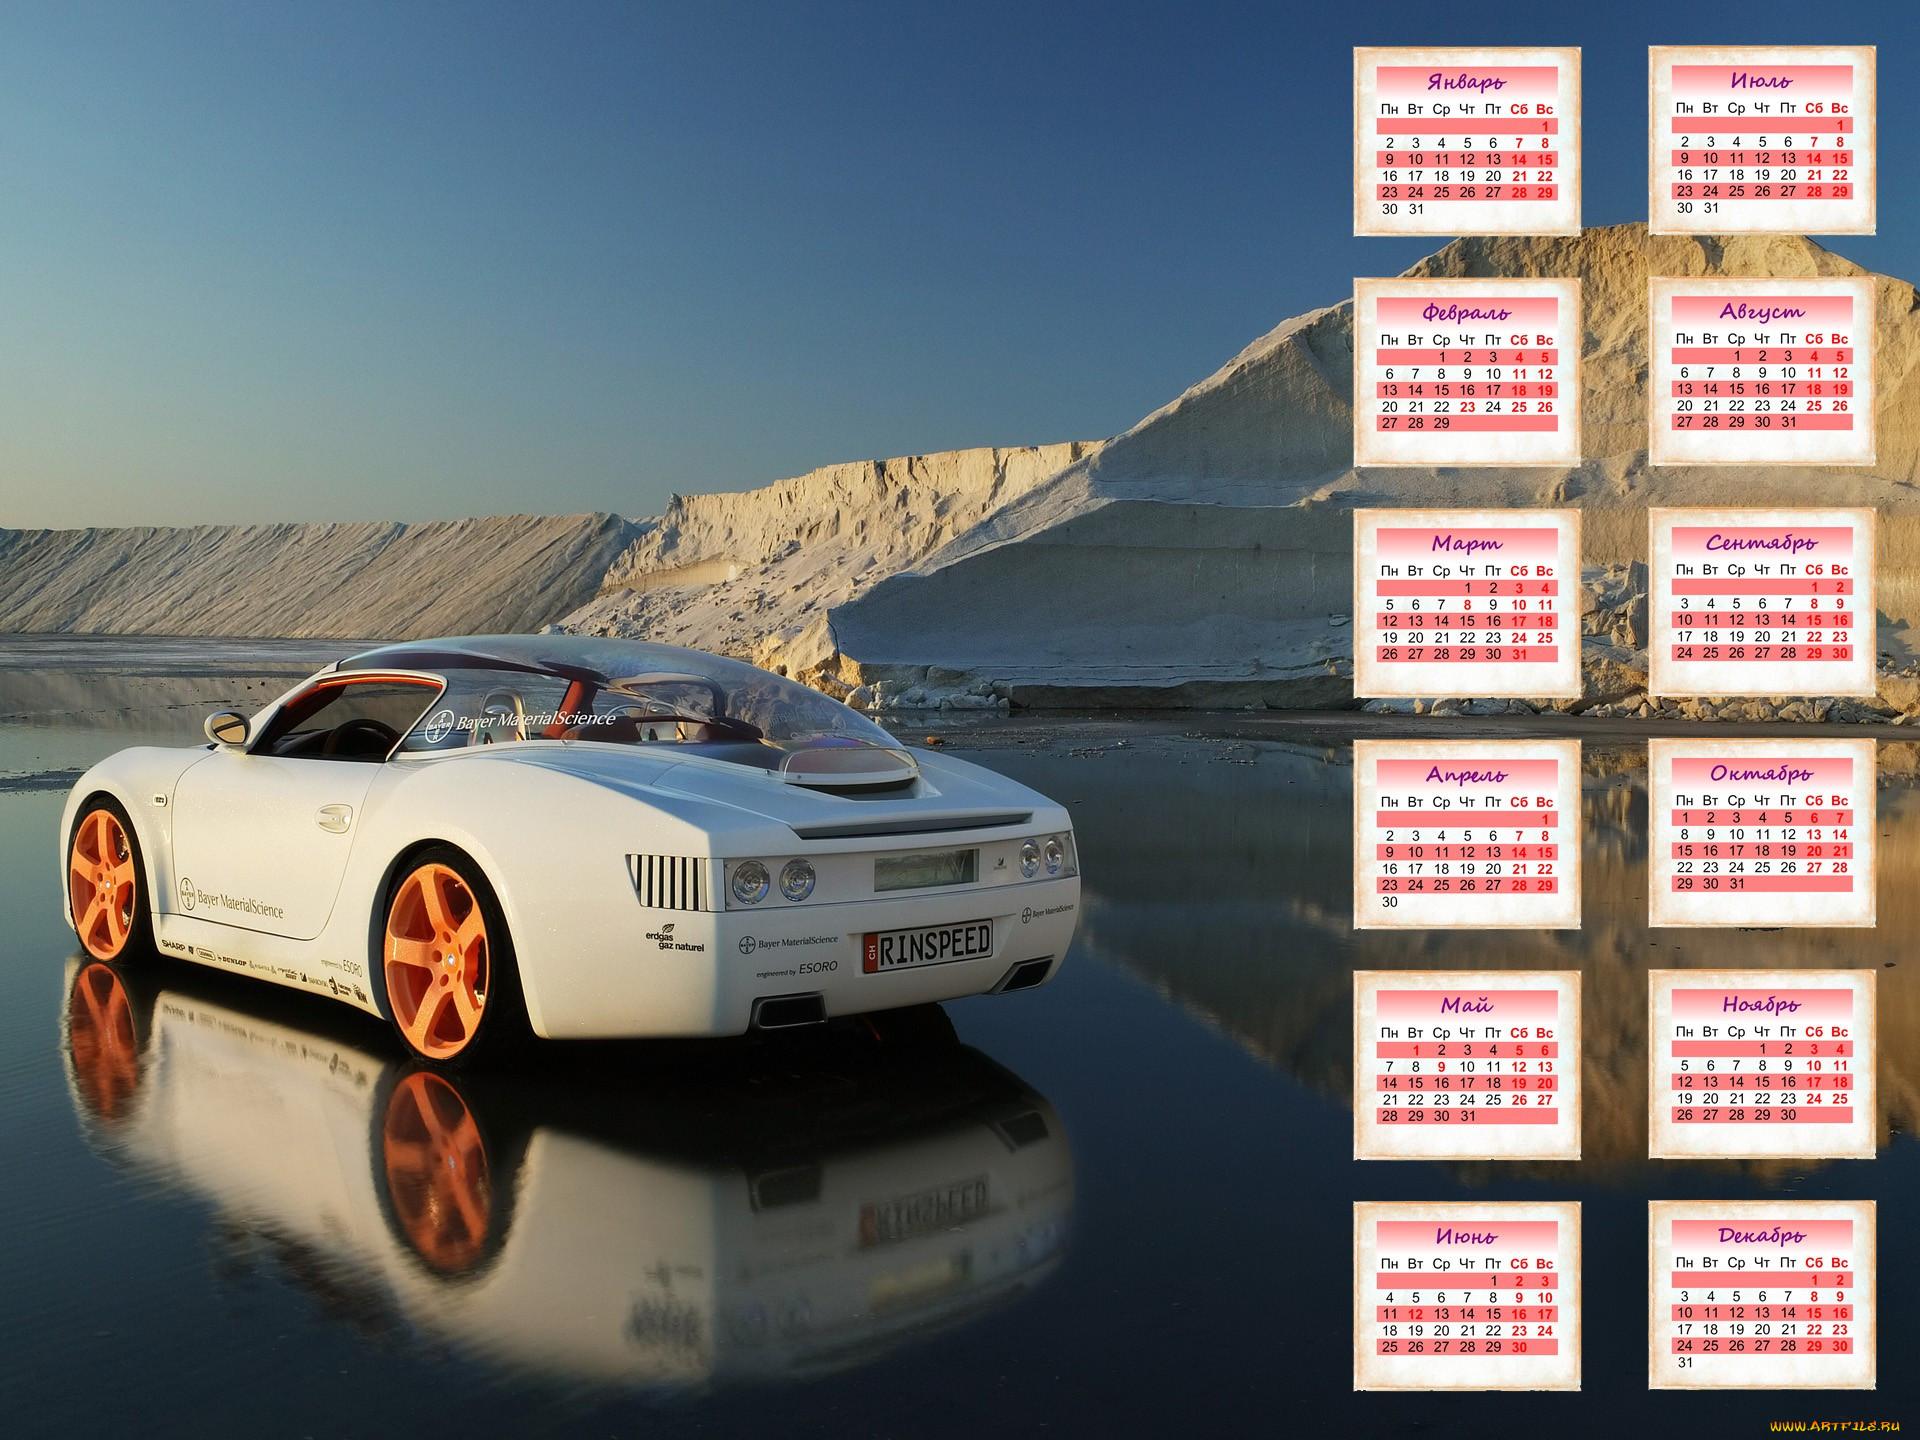 Картинки машин для календаря